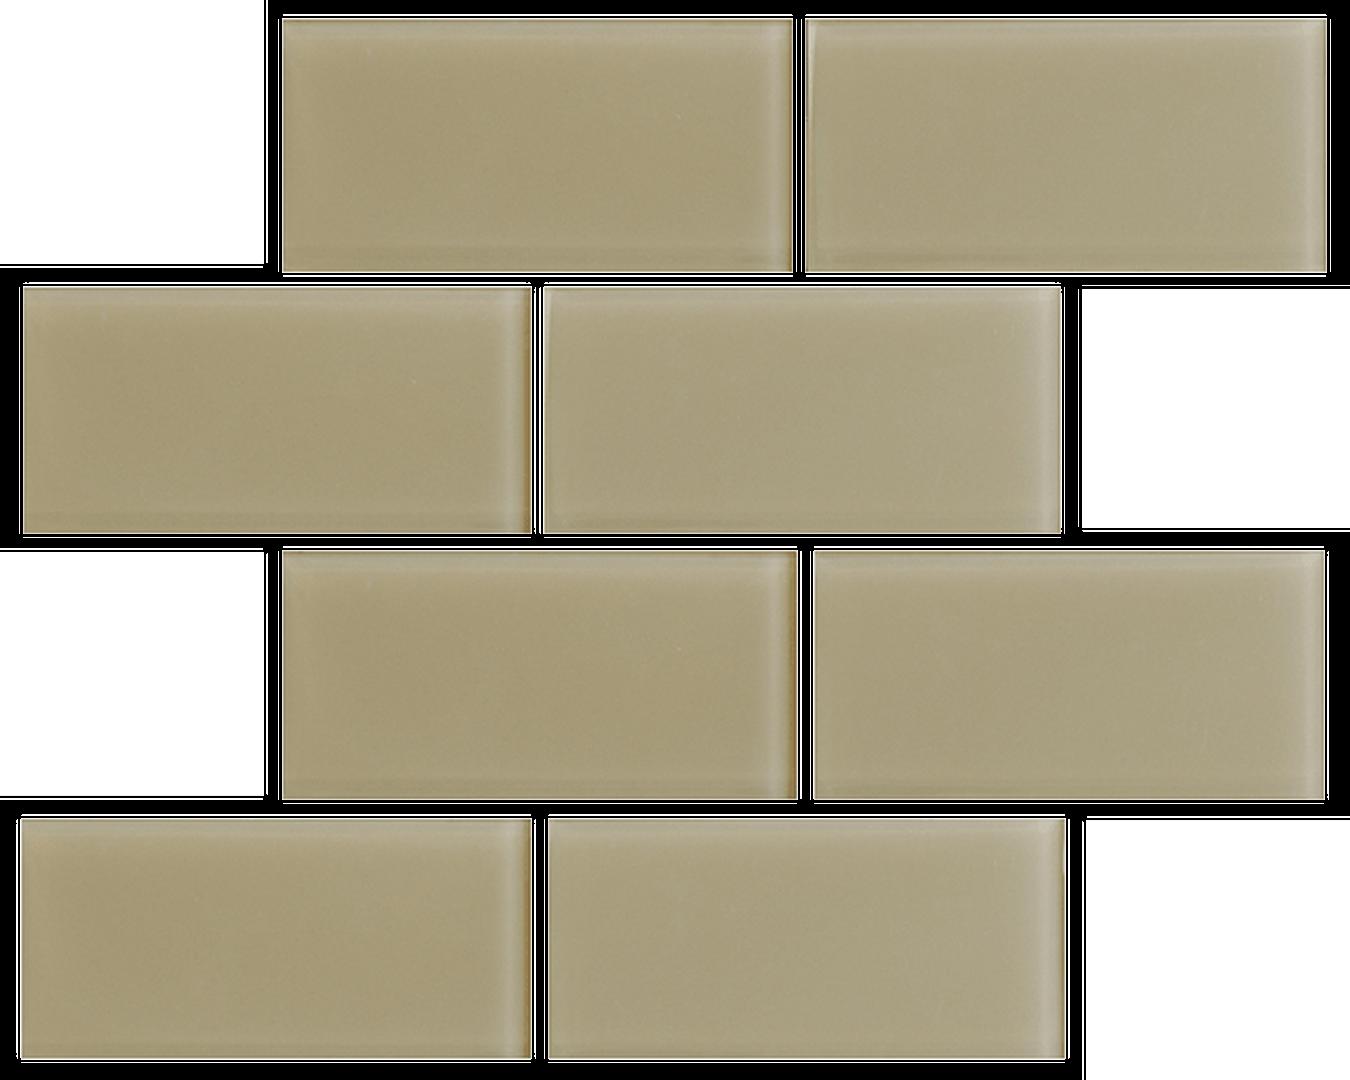 Crystal 3 x 6 Subway Tiles Sand Dollar